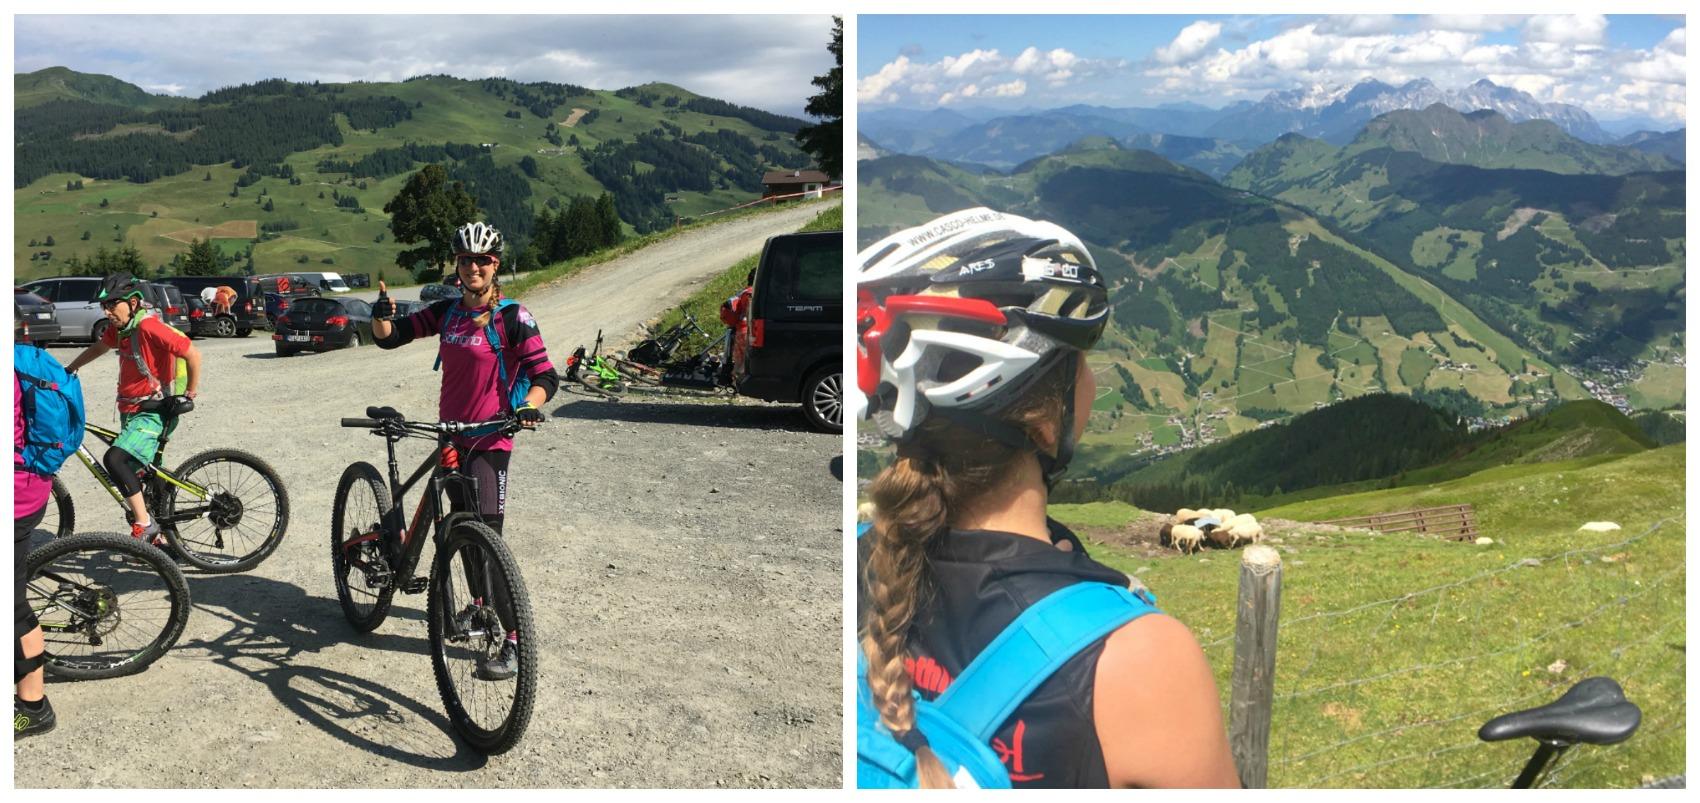 Klara-fuchs-womens-bike-camp-saalbach-frauen-fitness-fitnessblog-downhill-bike-m